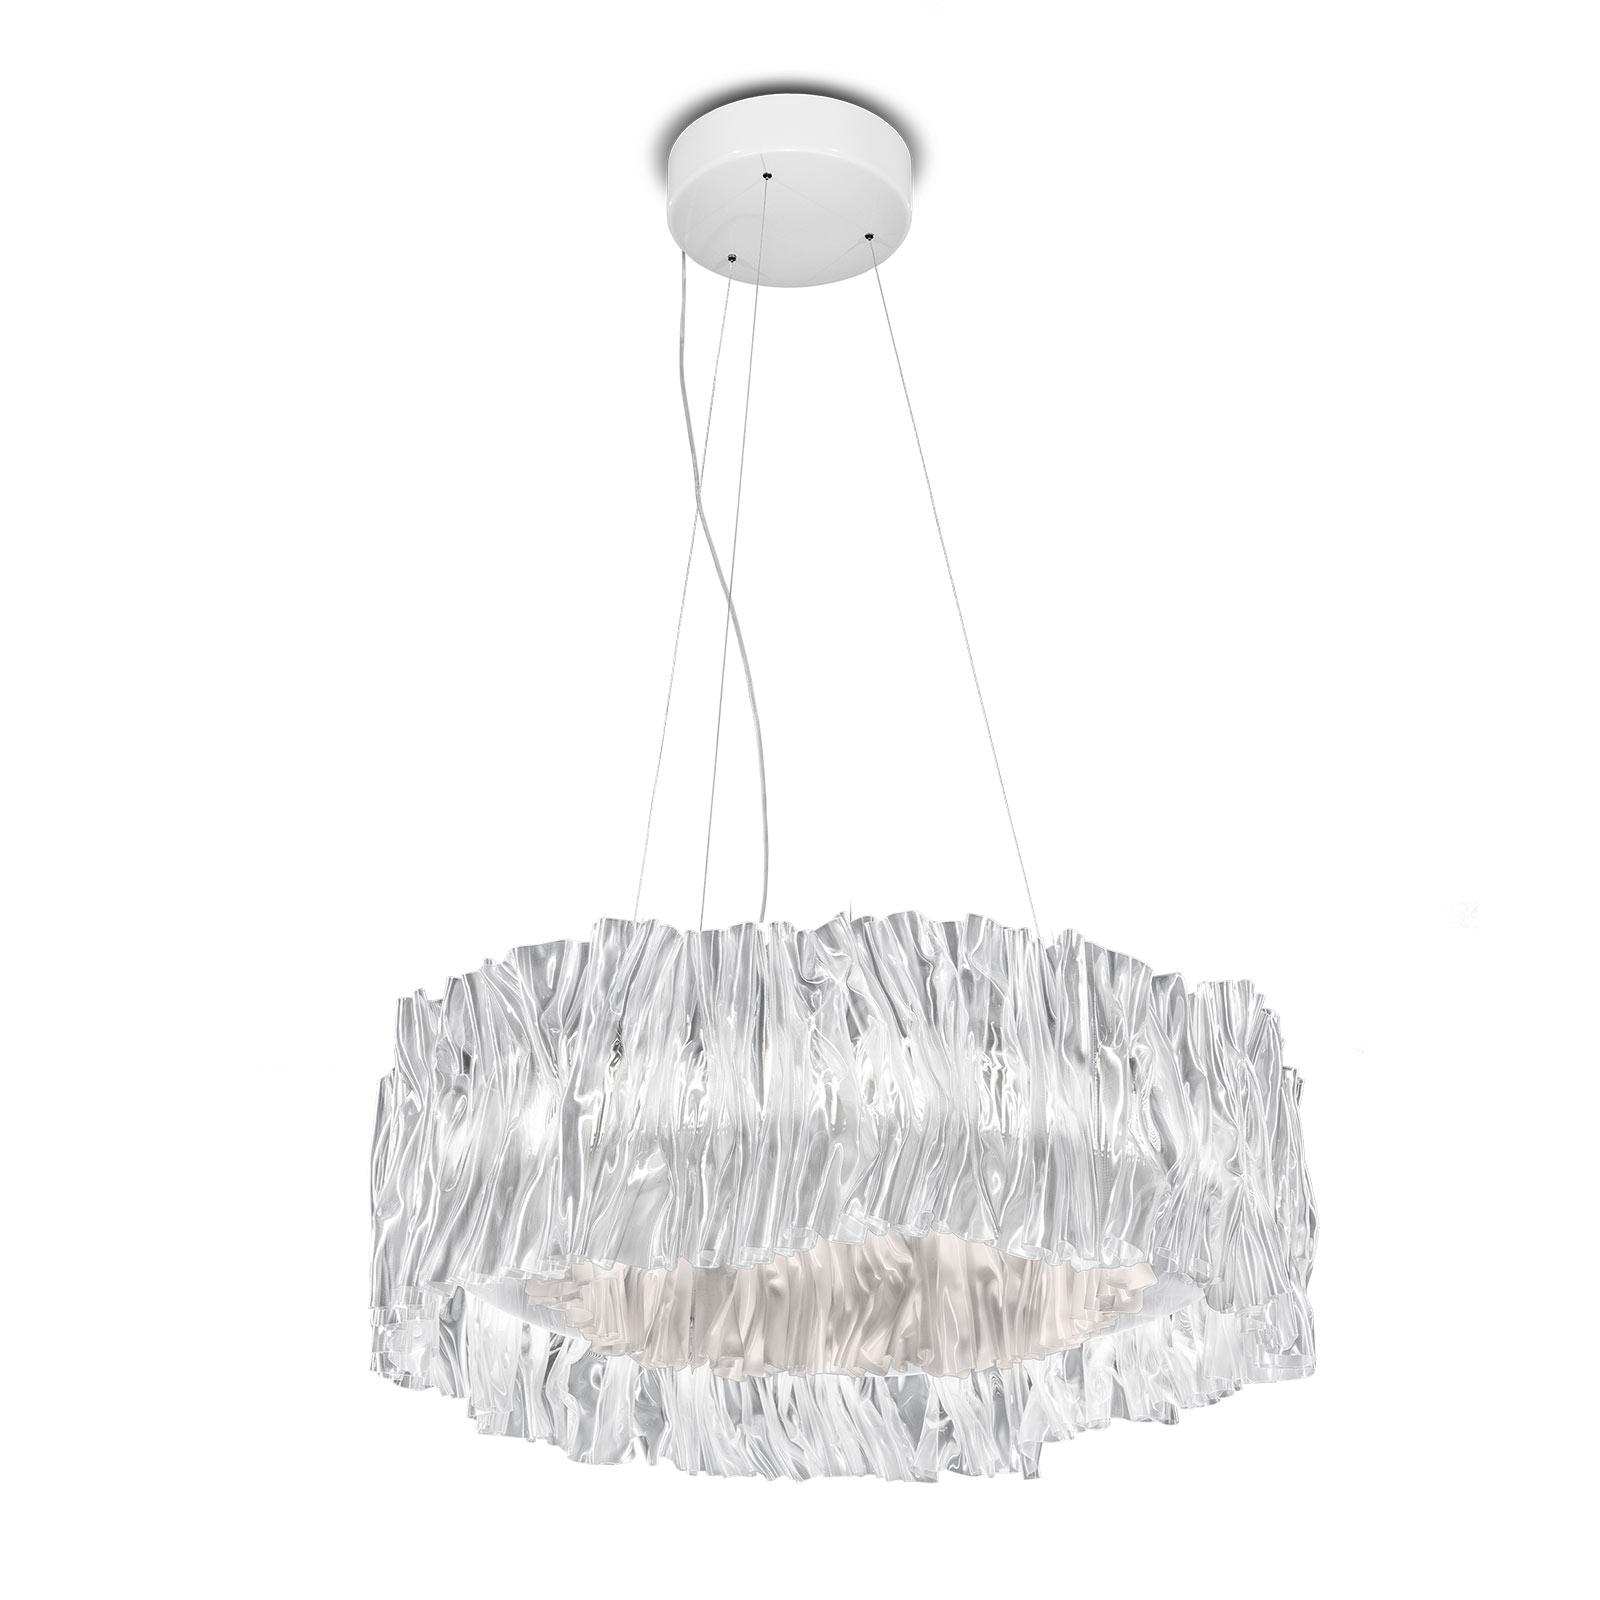 Slamp Accordéon lampa wisząca LED biała 2700K